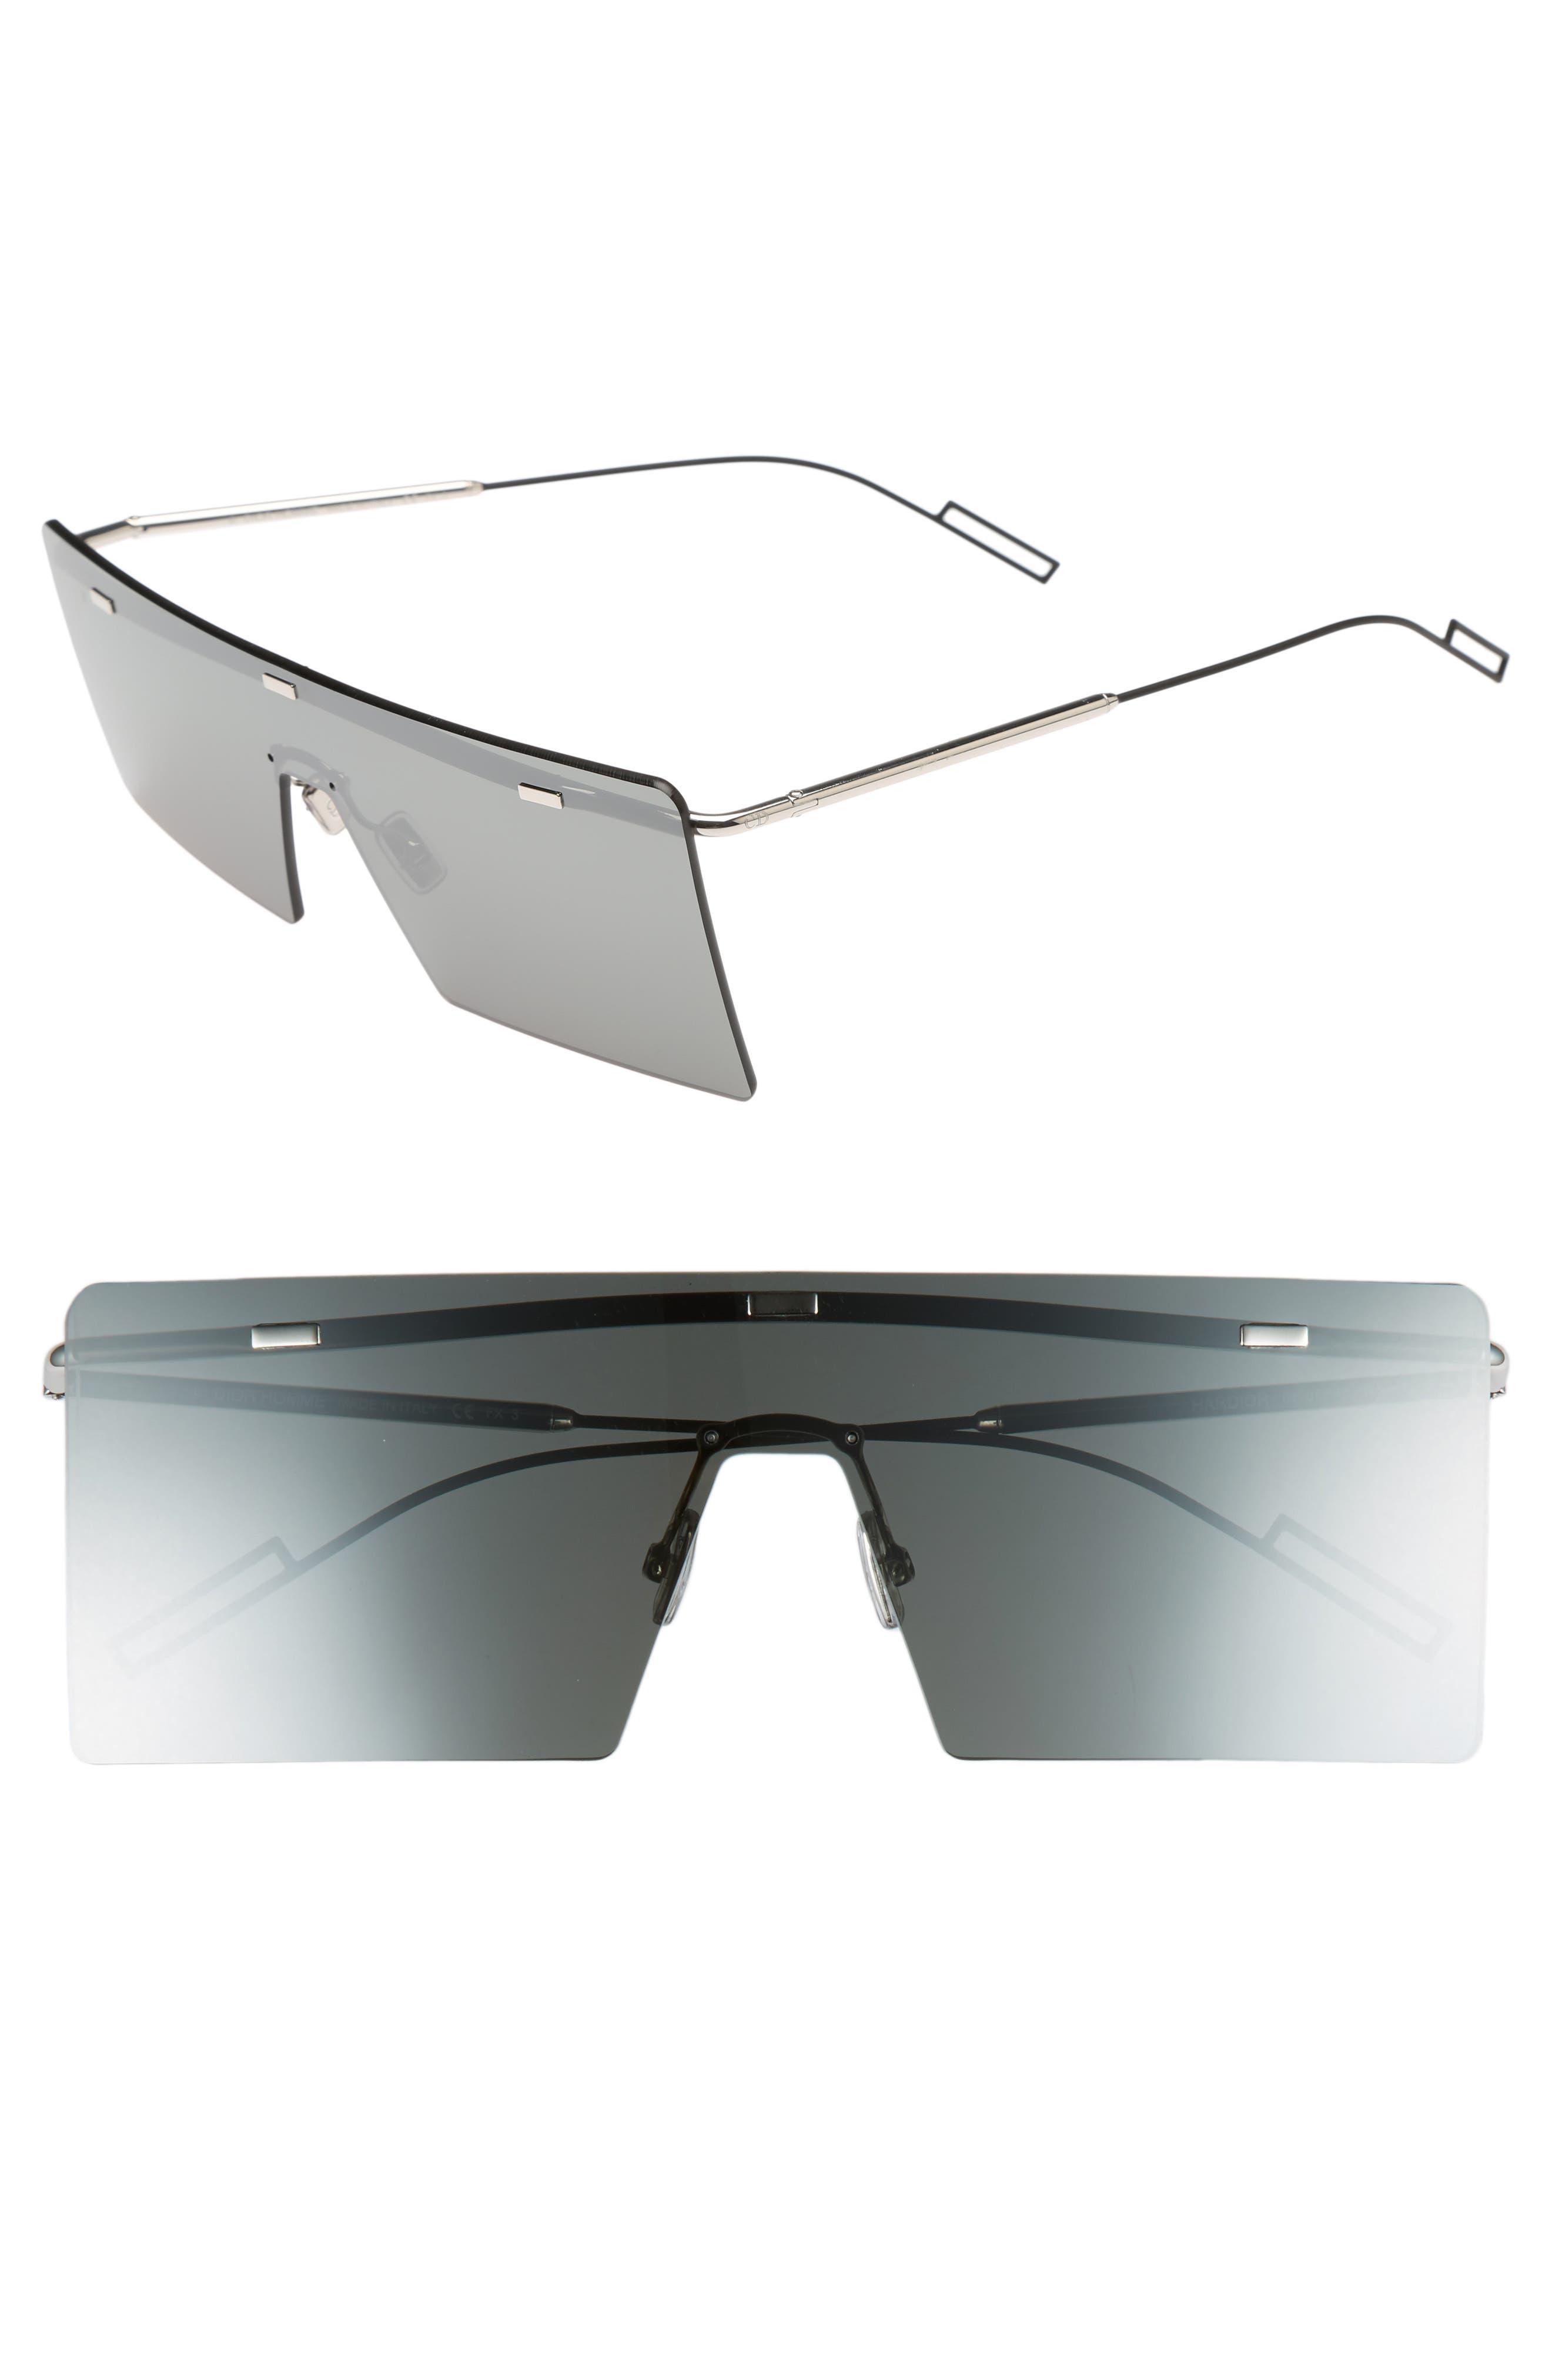 Hardior 65mm Sunglasses,                             Main thumbnail 1, color,                             041